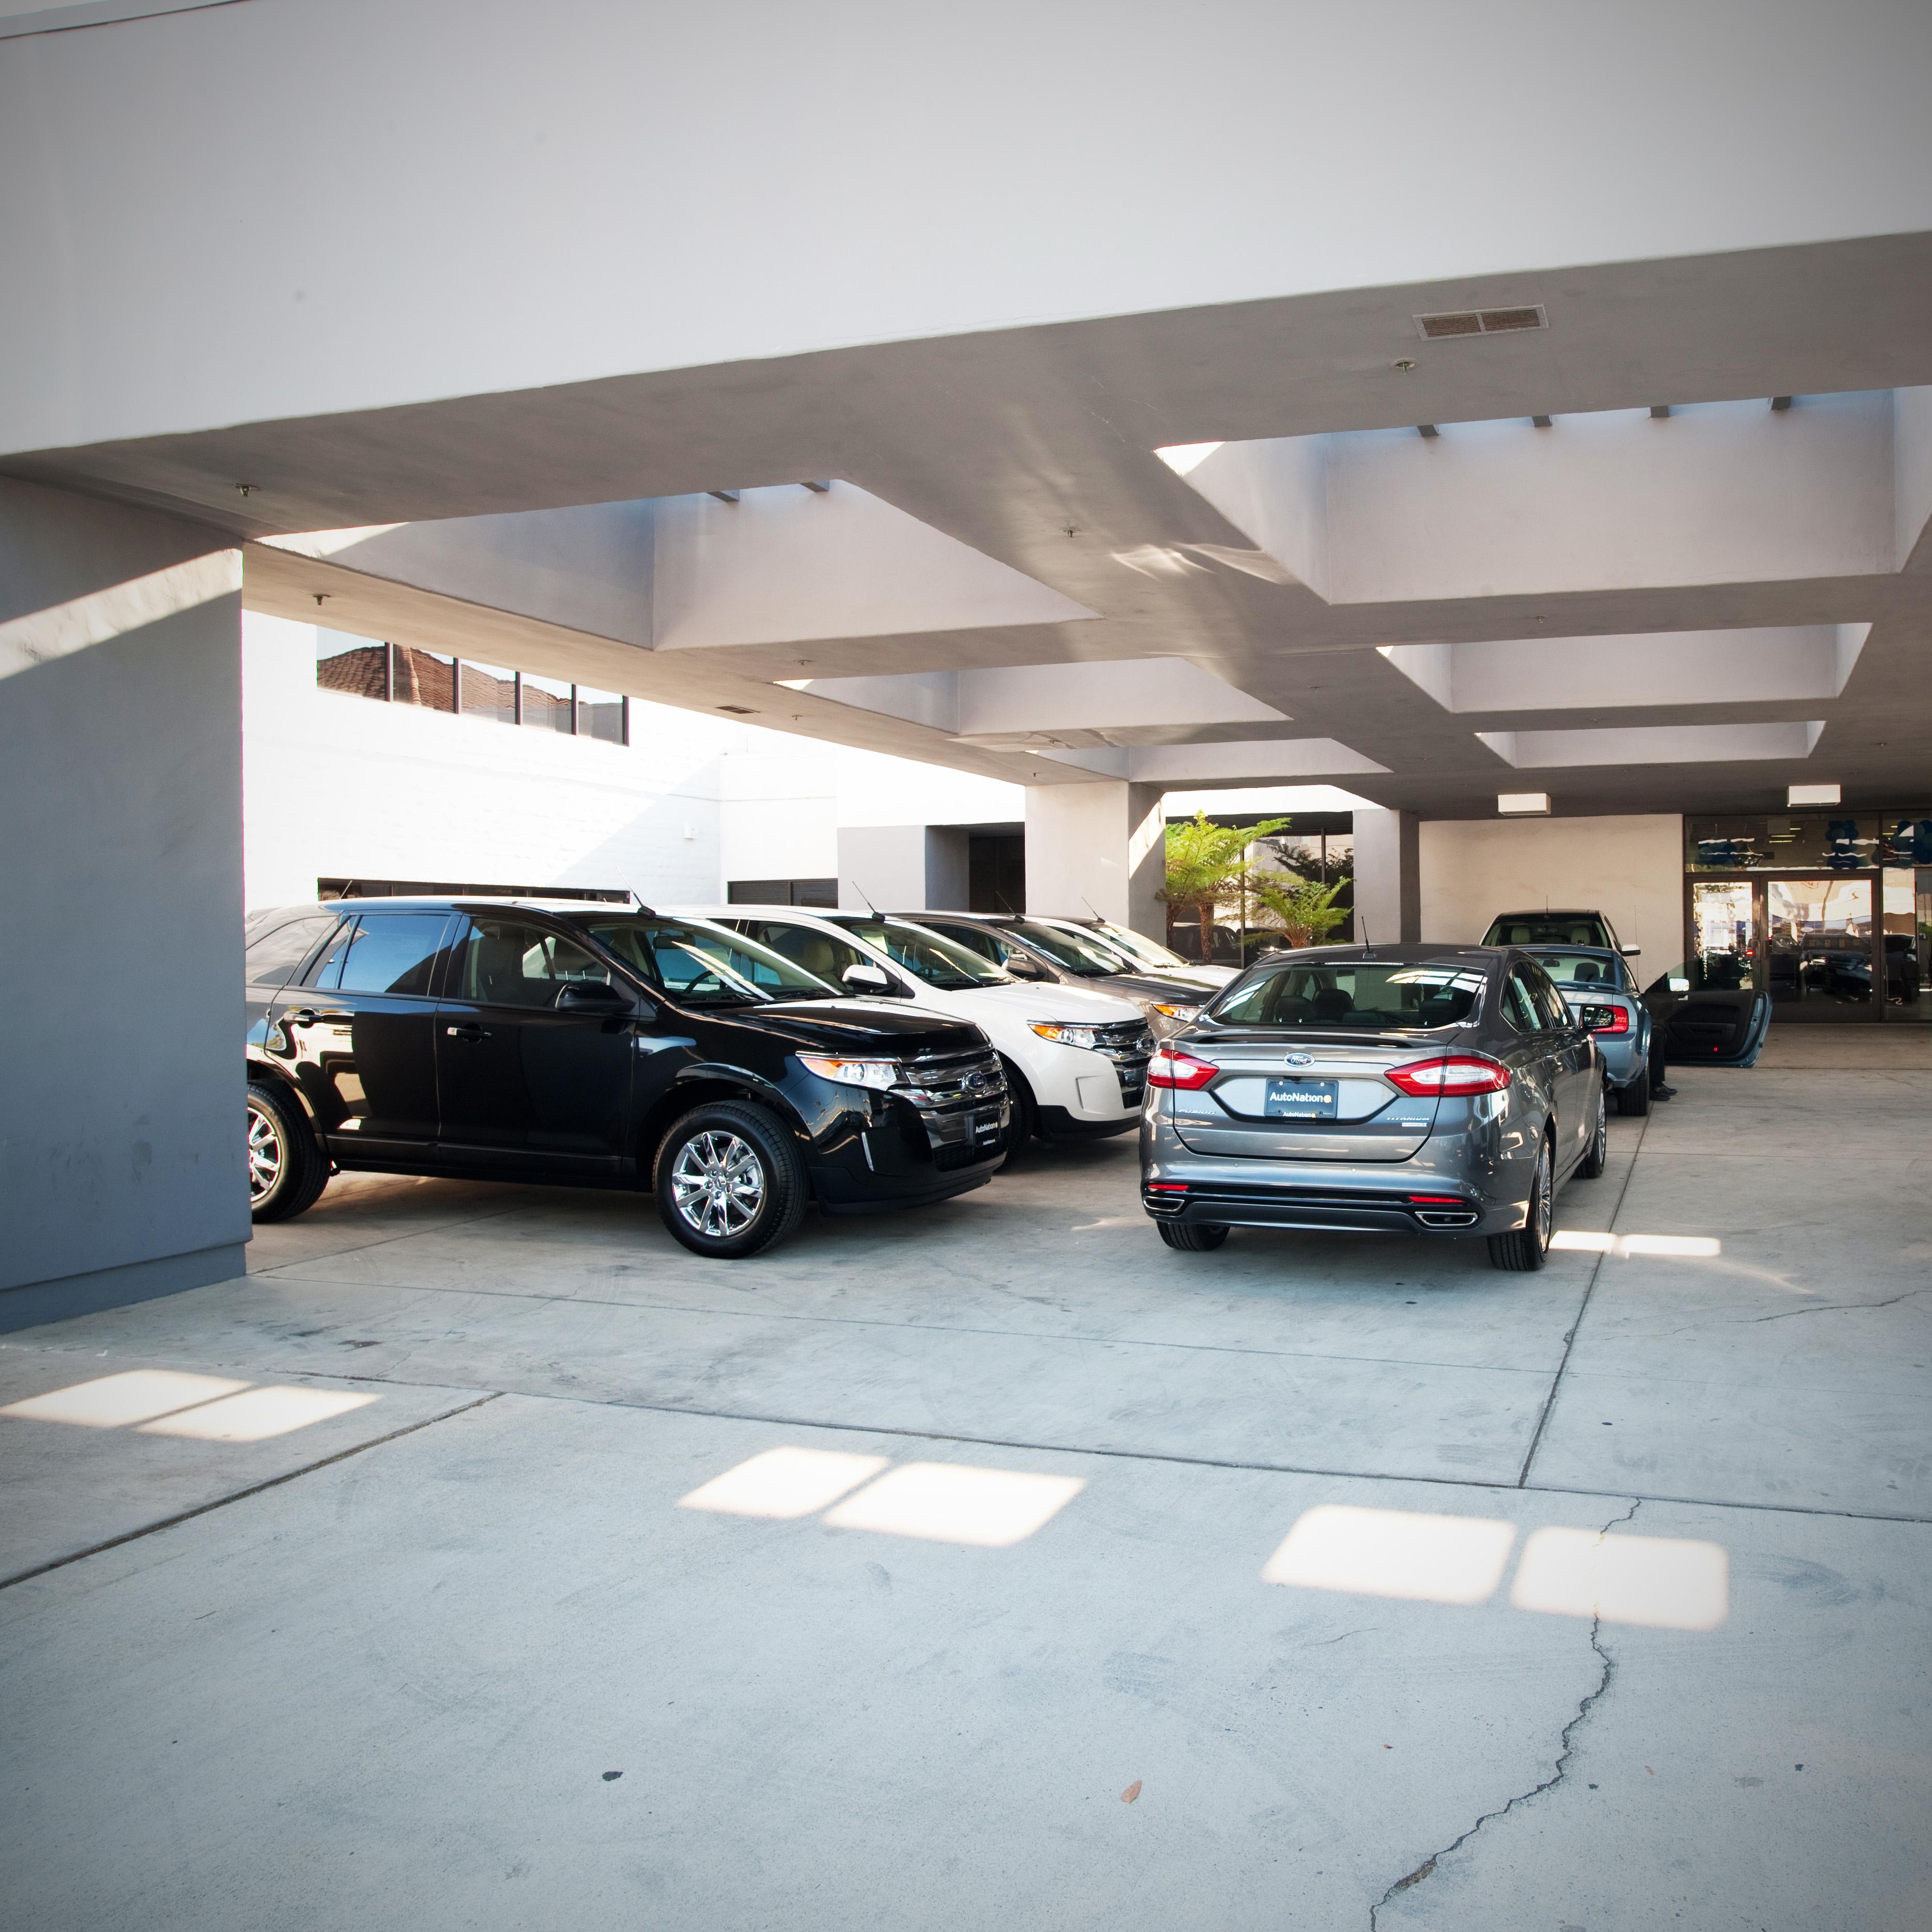 AutoNation Ford Tustin, Tustin California (CA ...